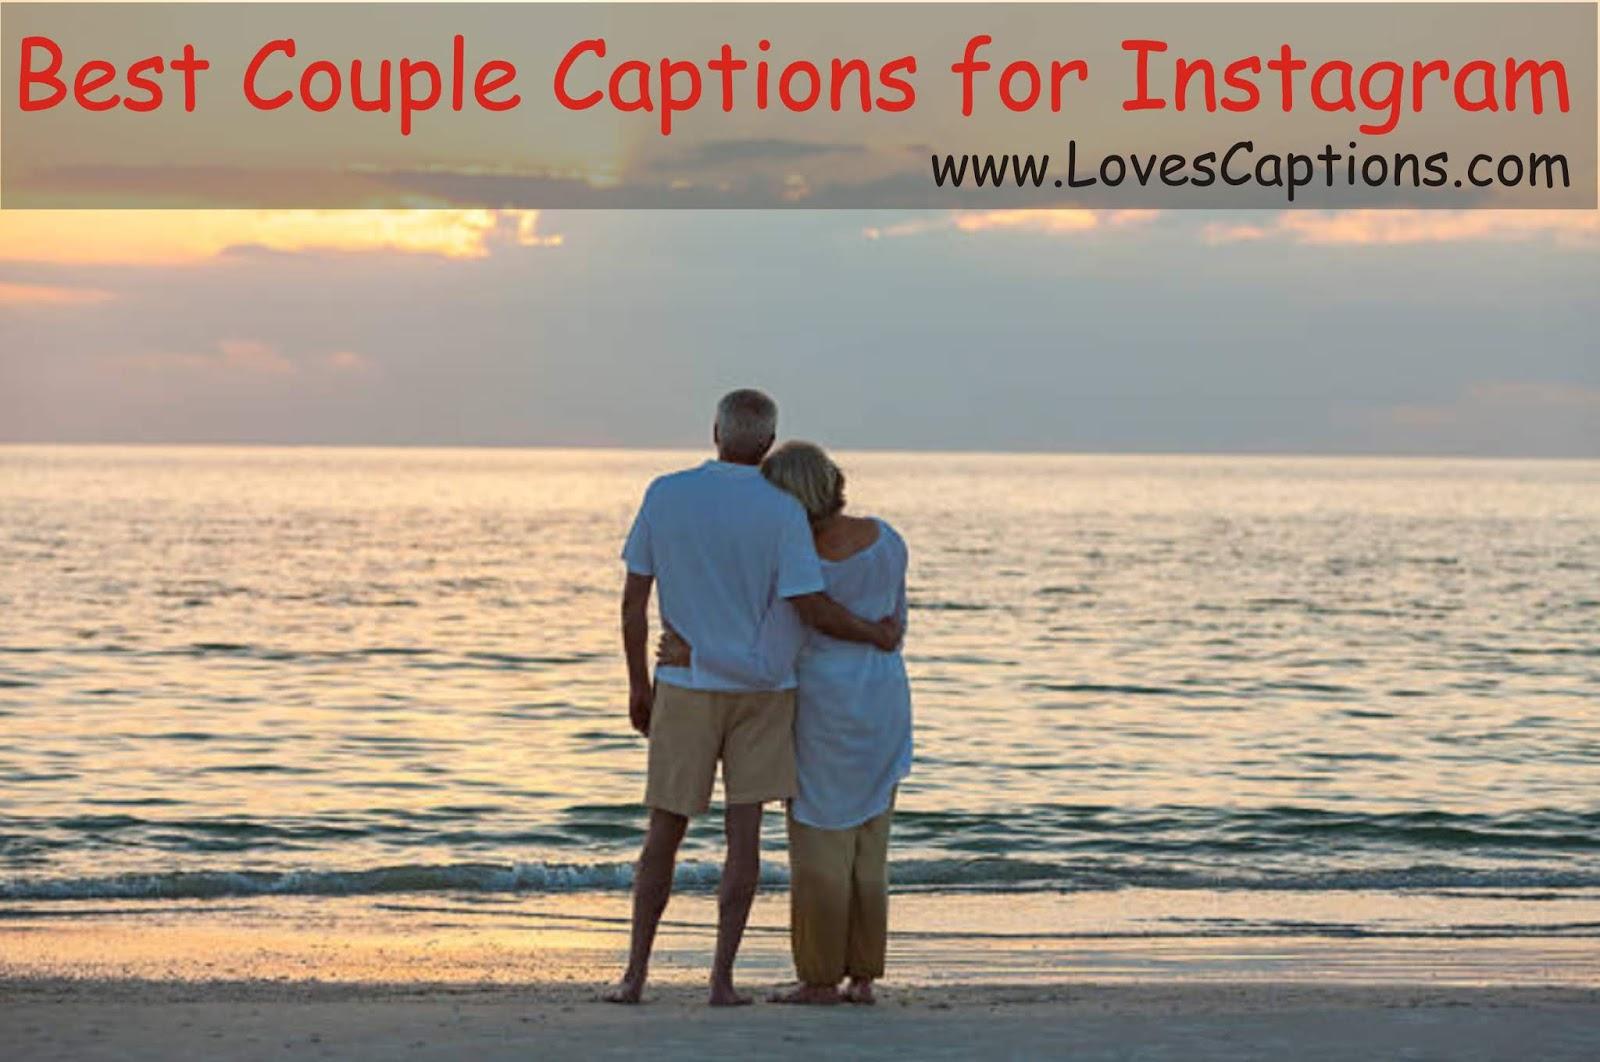 cute couple captions